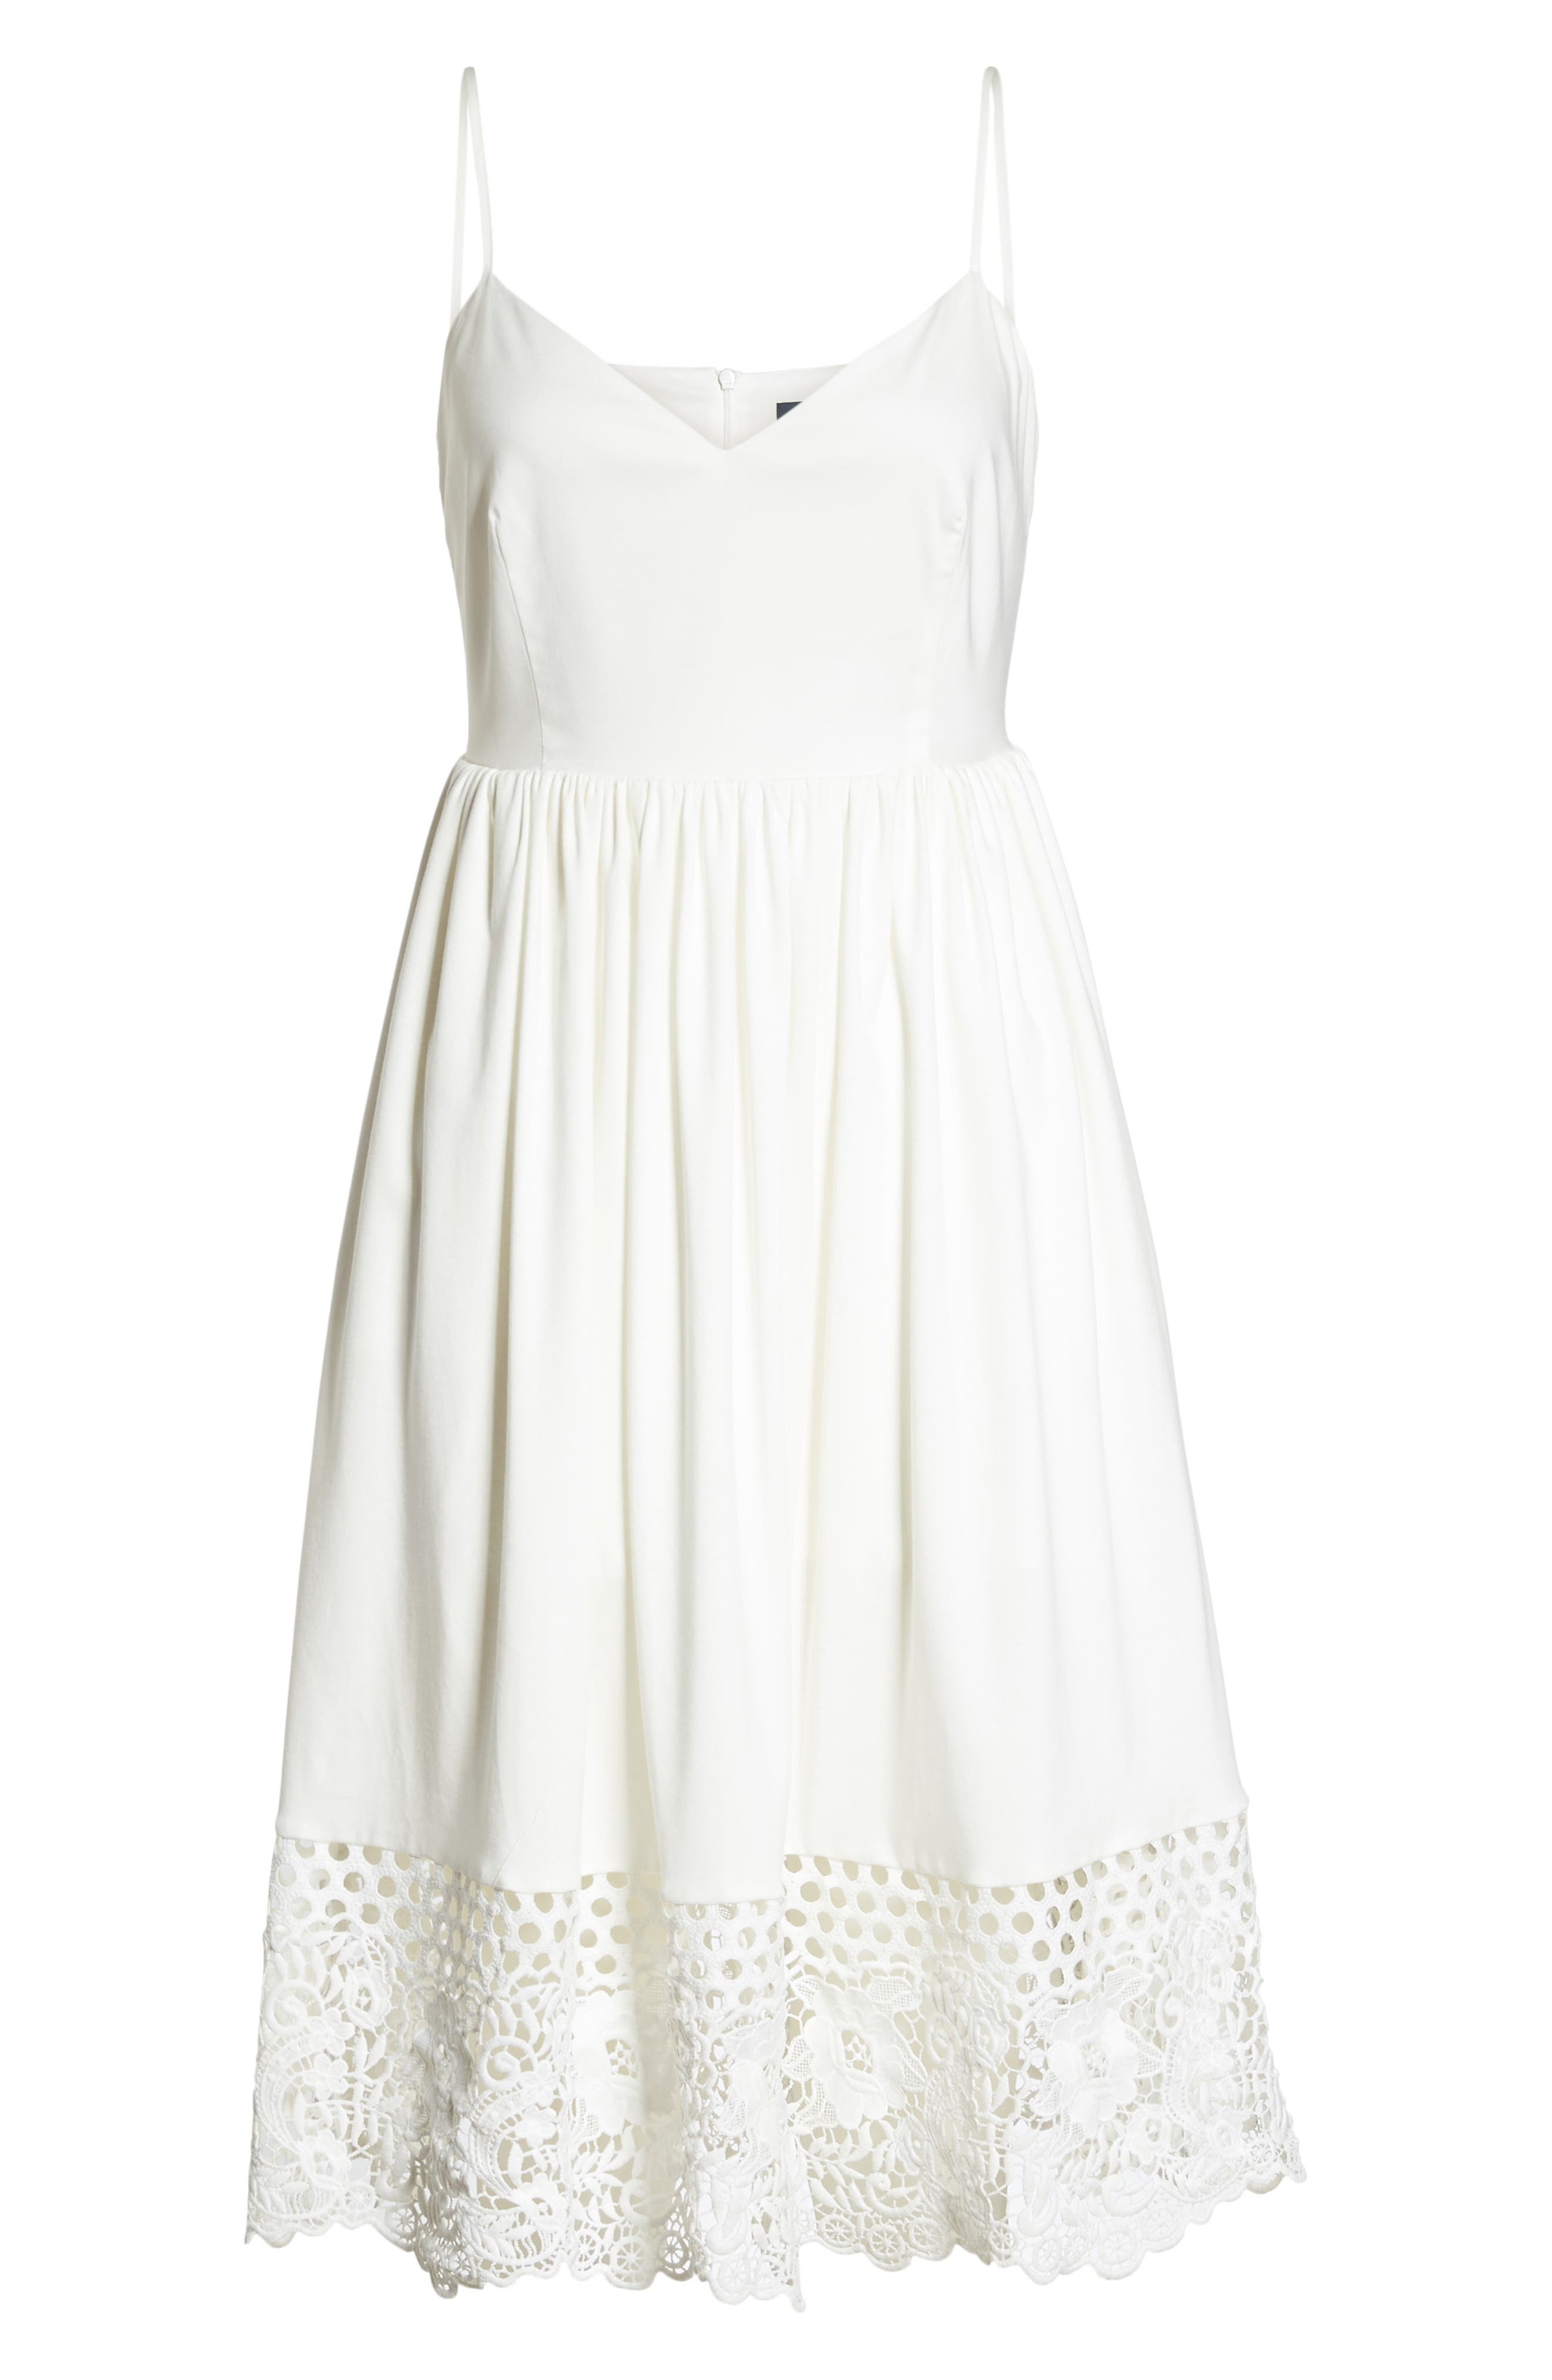 Salerno Lace Trim Jersey Dress,                             Alternate thumbnail 7, color,                             106